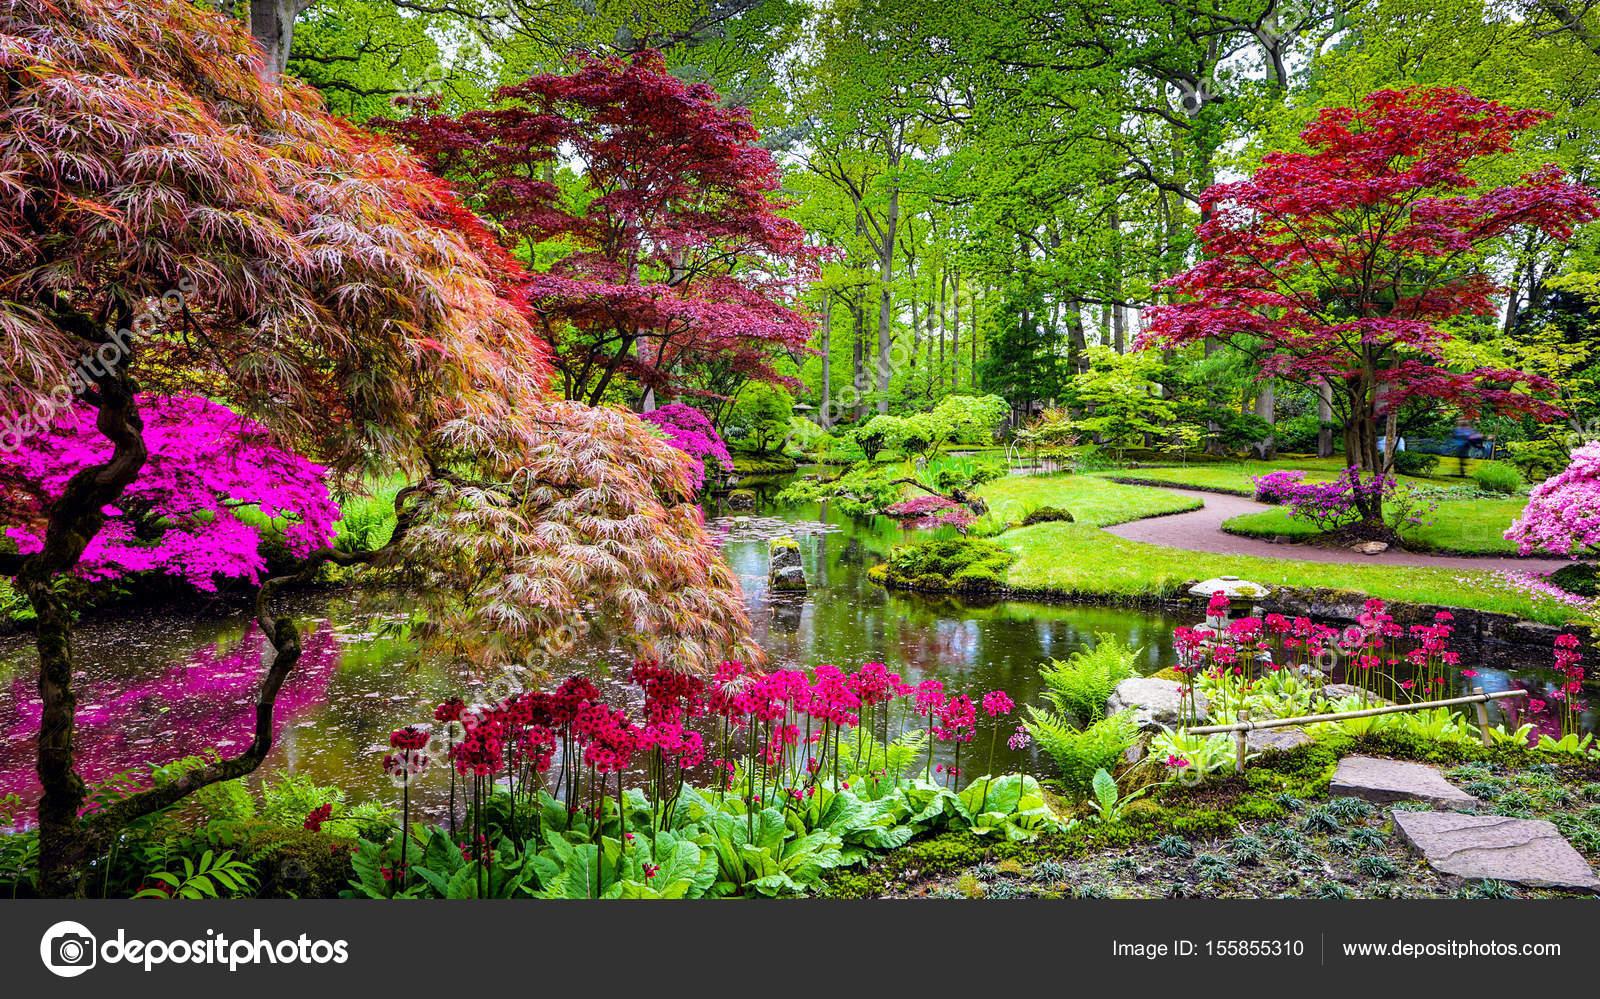 Japan Garden Flowers: Traditional Japanese Garden In The Hague.